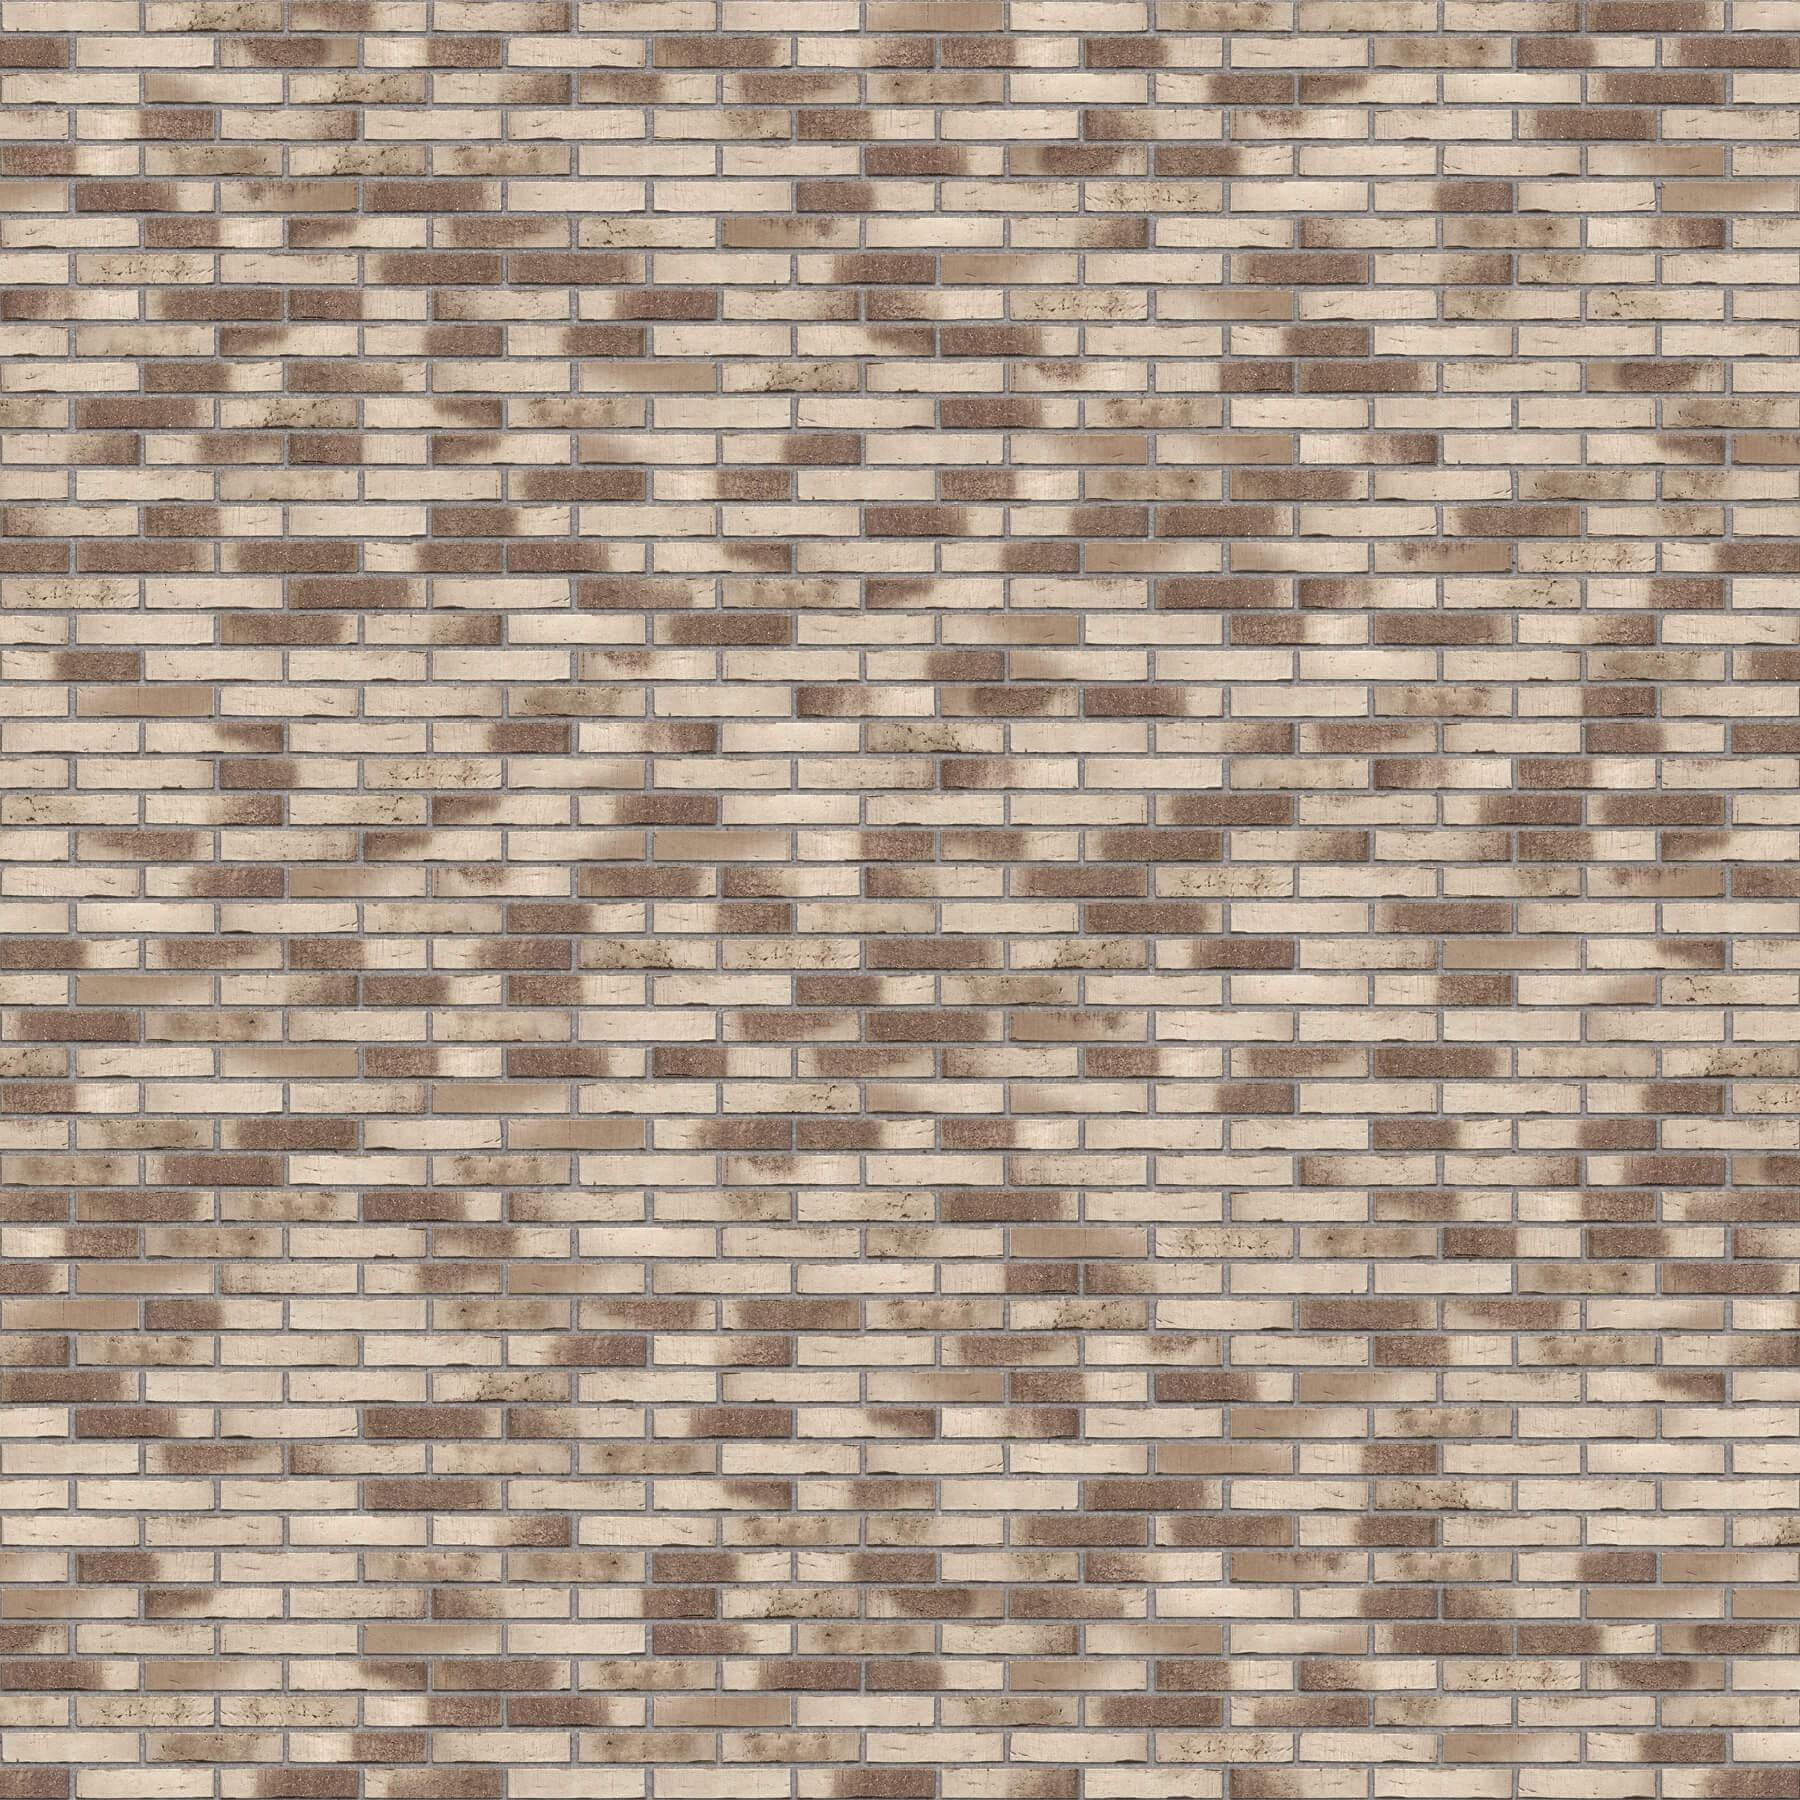 Puna-cigla-FeldHaus-Klinker-brick-house-beograd-df-k-948-Siva Fuga